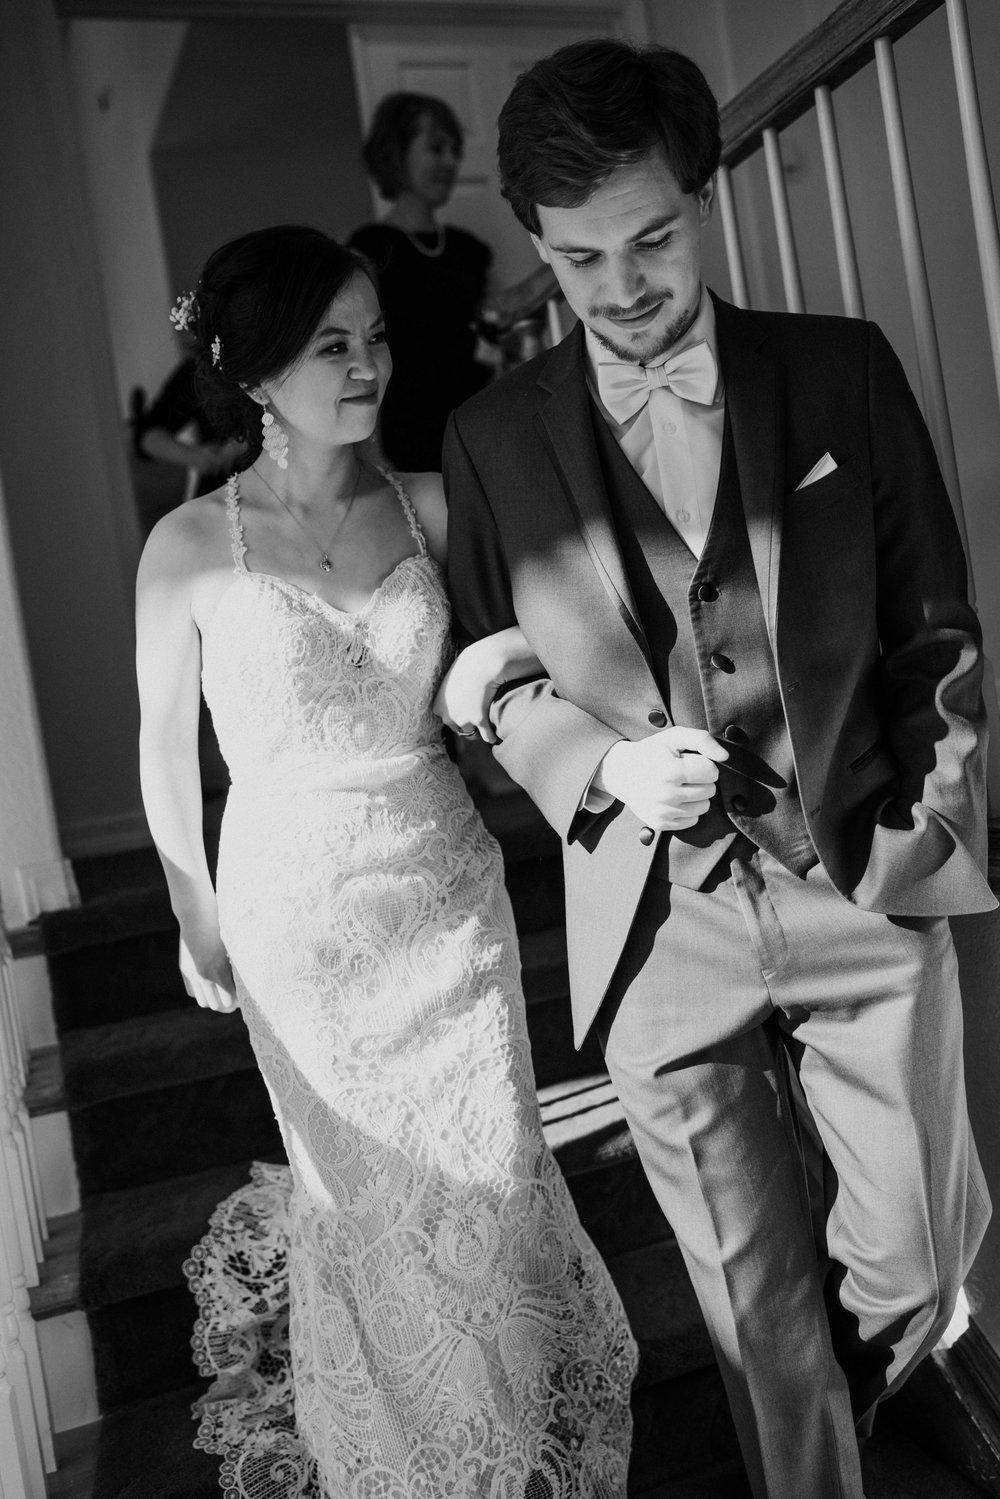 denver wedding photographer lioncrest manor in lyons ben and mali -DSC06279.jpg